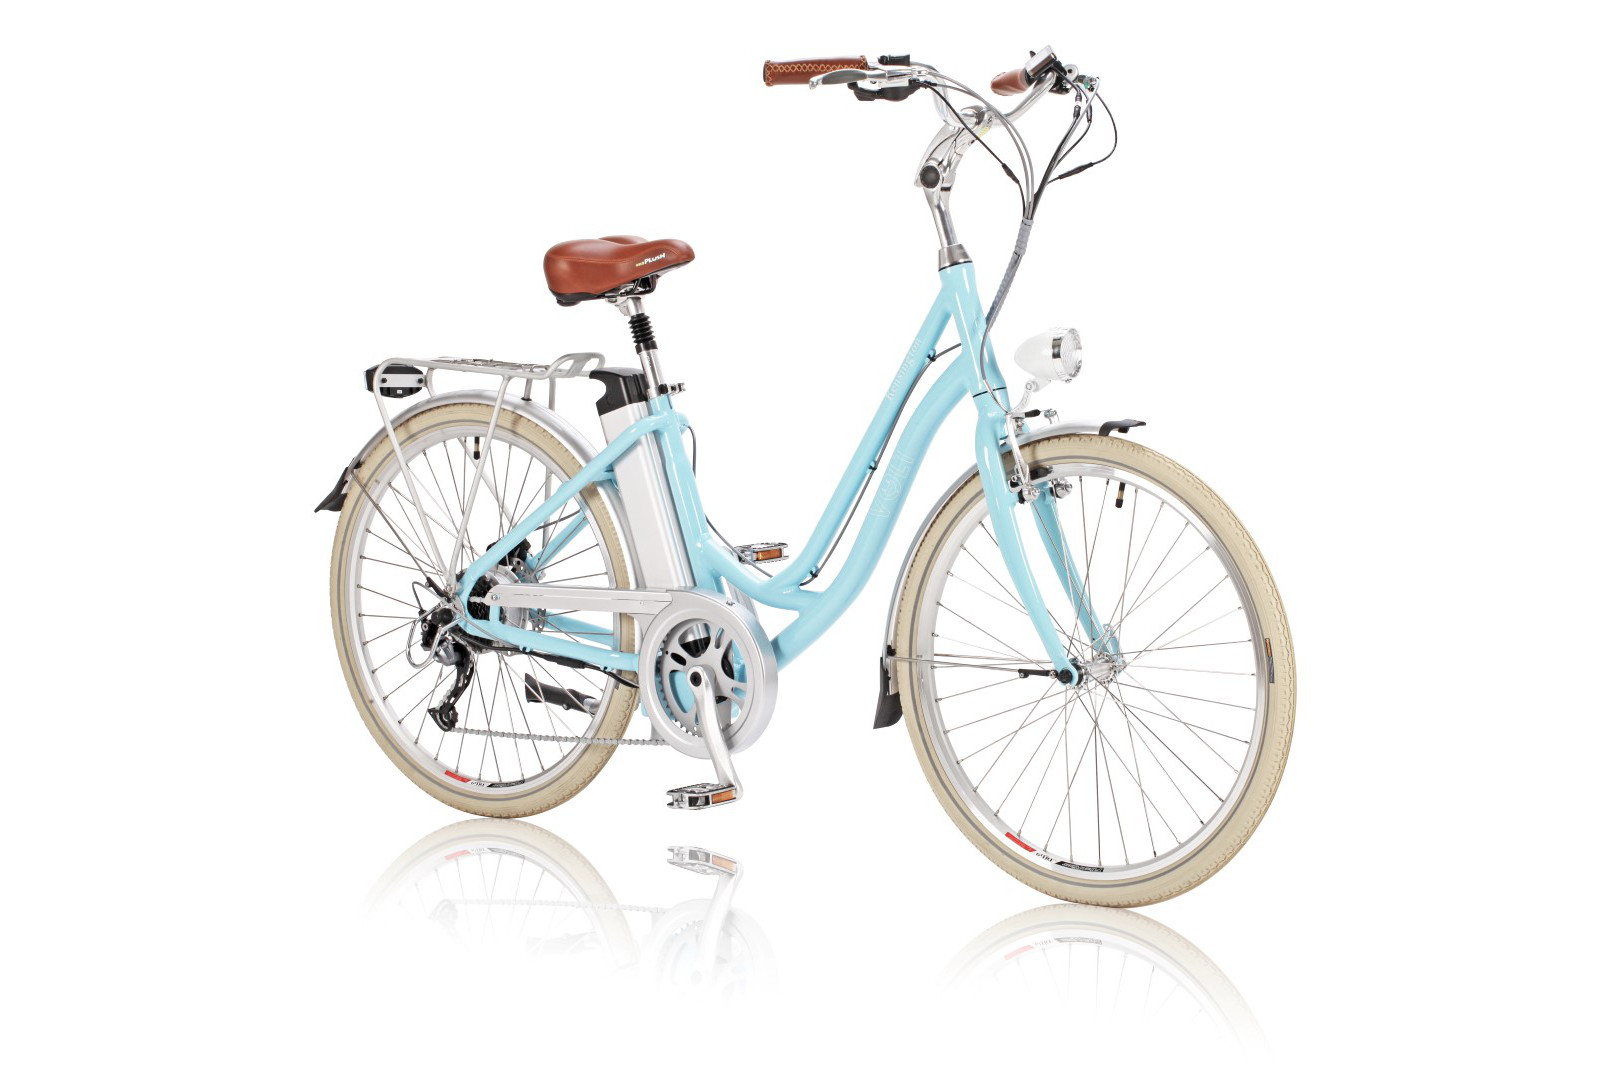 69aee4bea76 ... VOLT™ Kensington Step Through Electric Bicycle